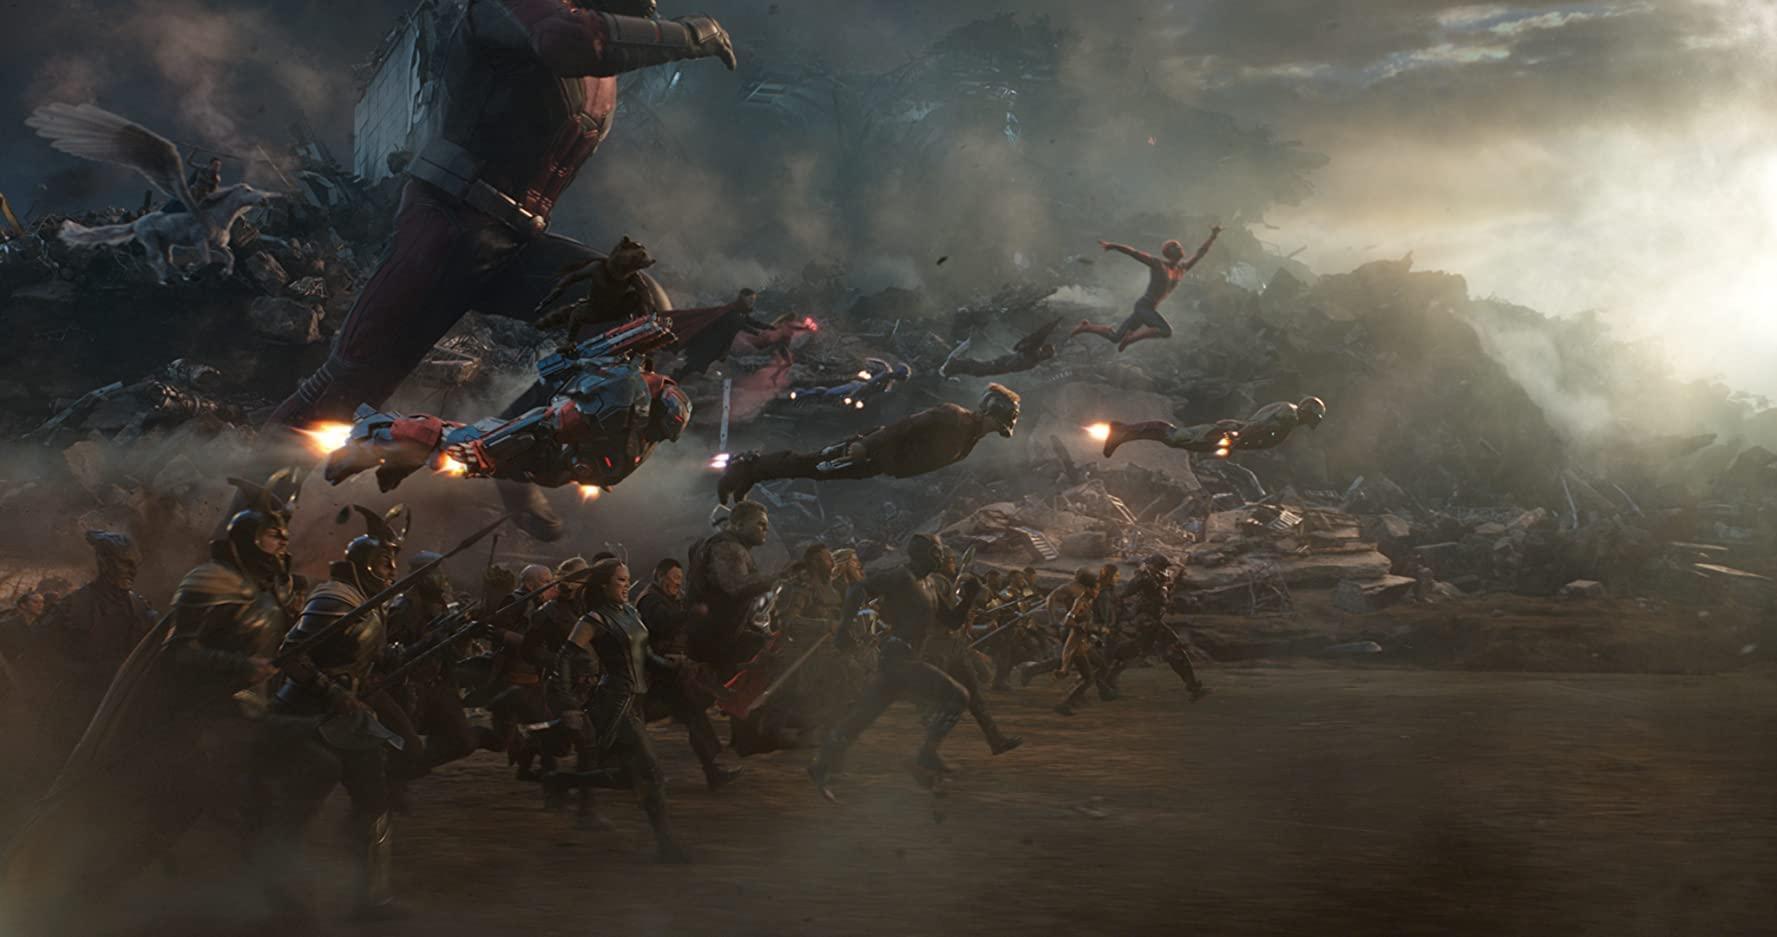 مشاهدة فيلم Avengers: Endgame (2019) مترجم HD اون لاين